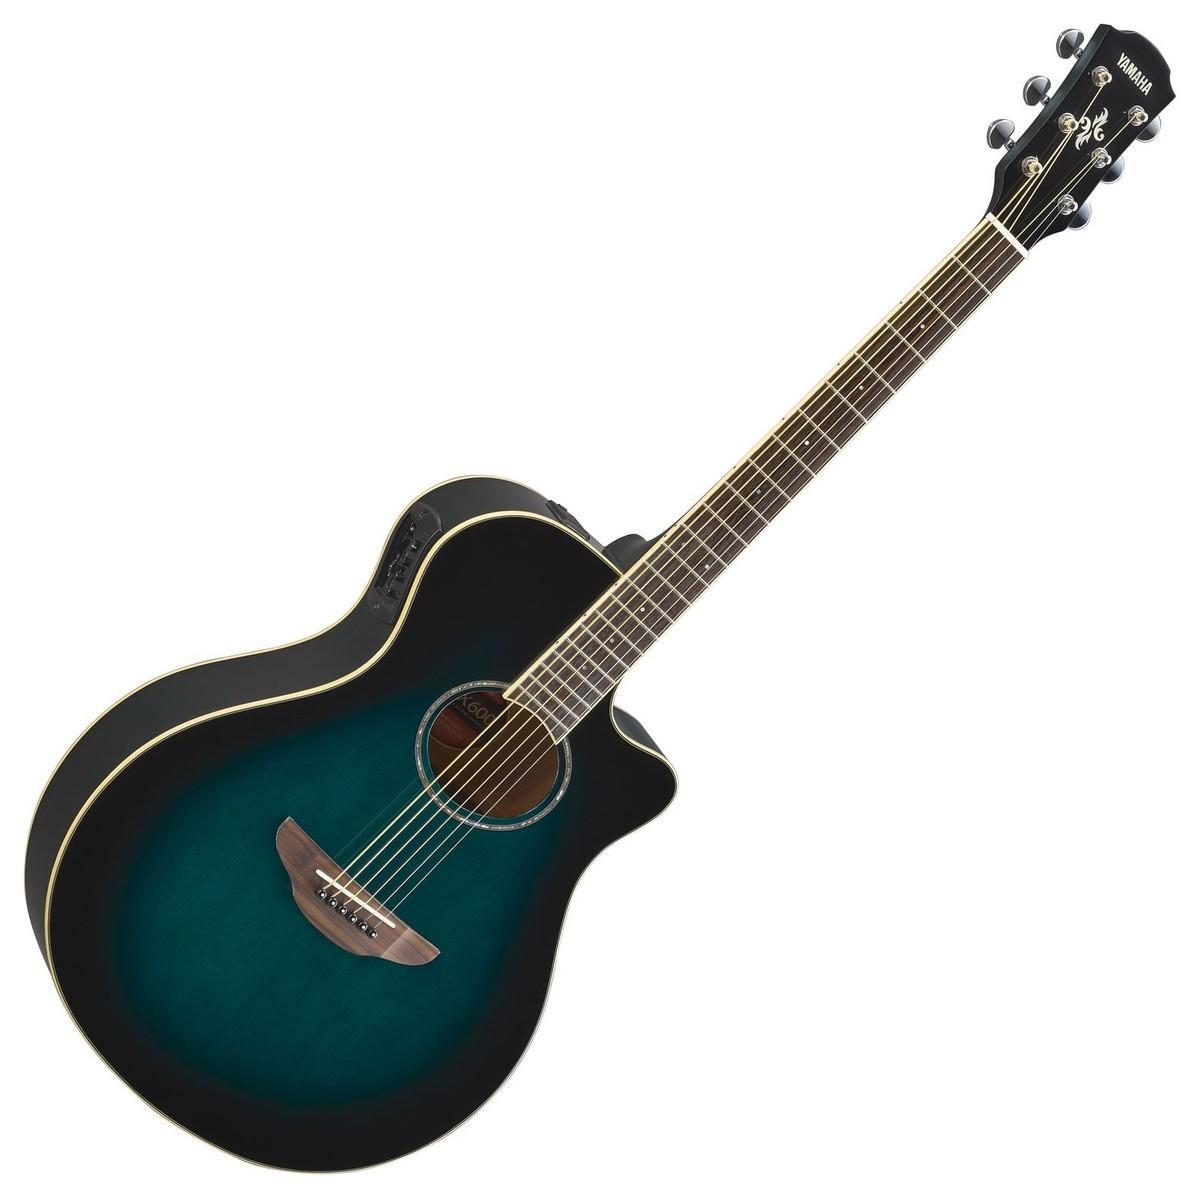 Đàn Guitar Acoustic Yamaha APX600 Oriental Blue Burst